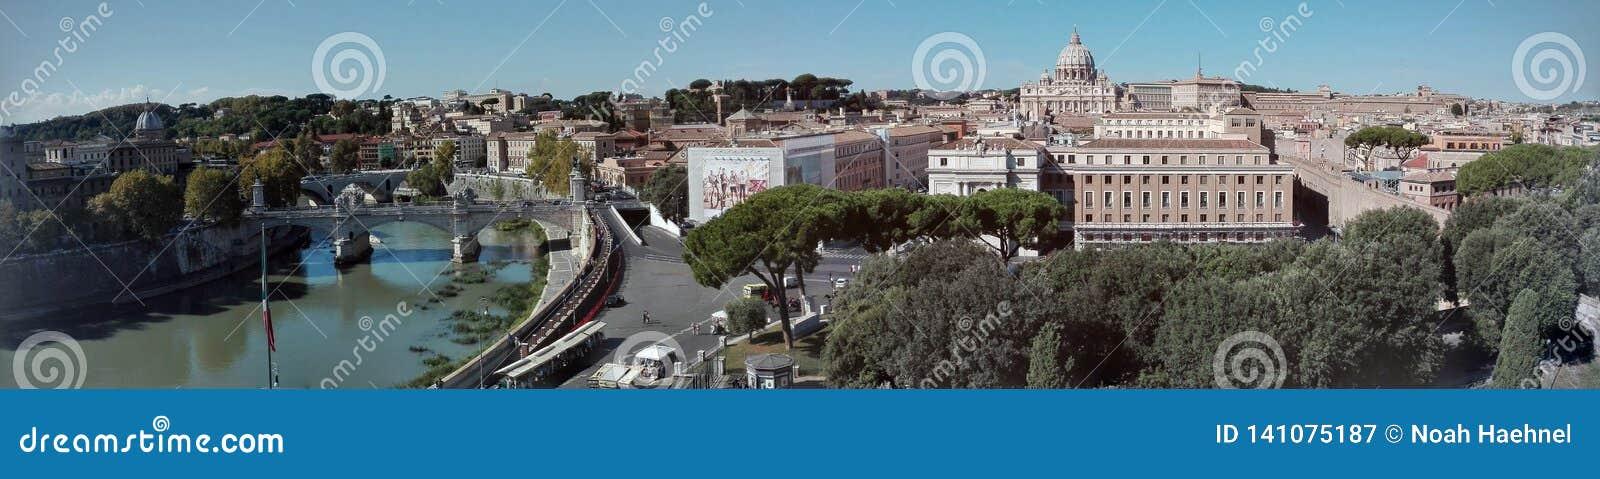 Panorama widok Rzym linia horyzontu Castel Sant'Angelo